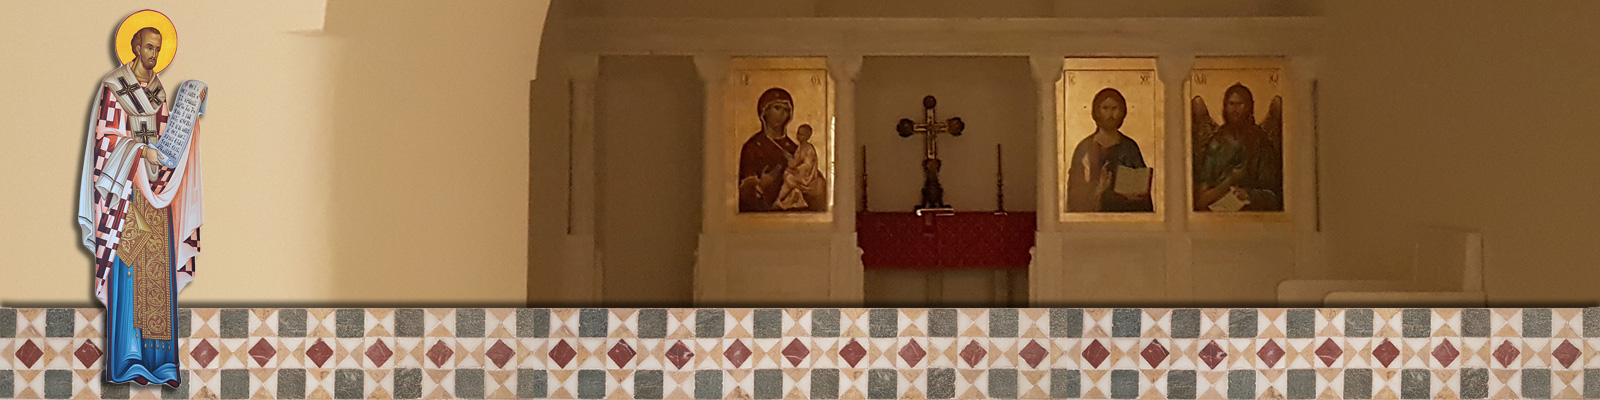 Kapelle zum Heiligen Johannes Chrysostomos